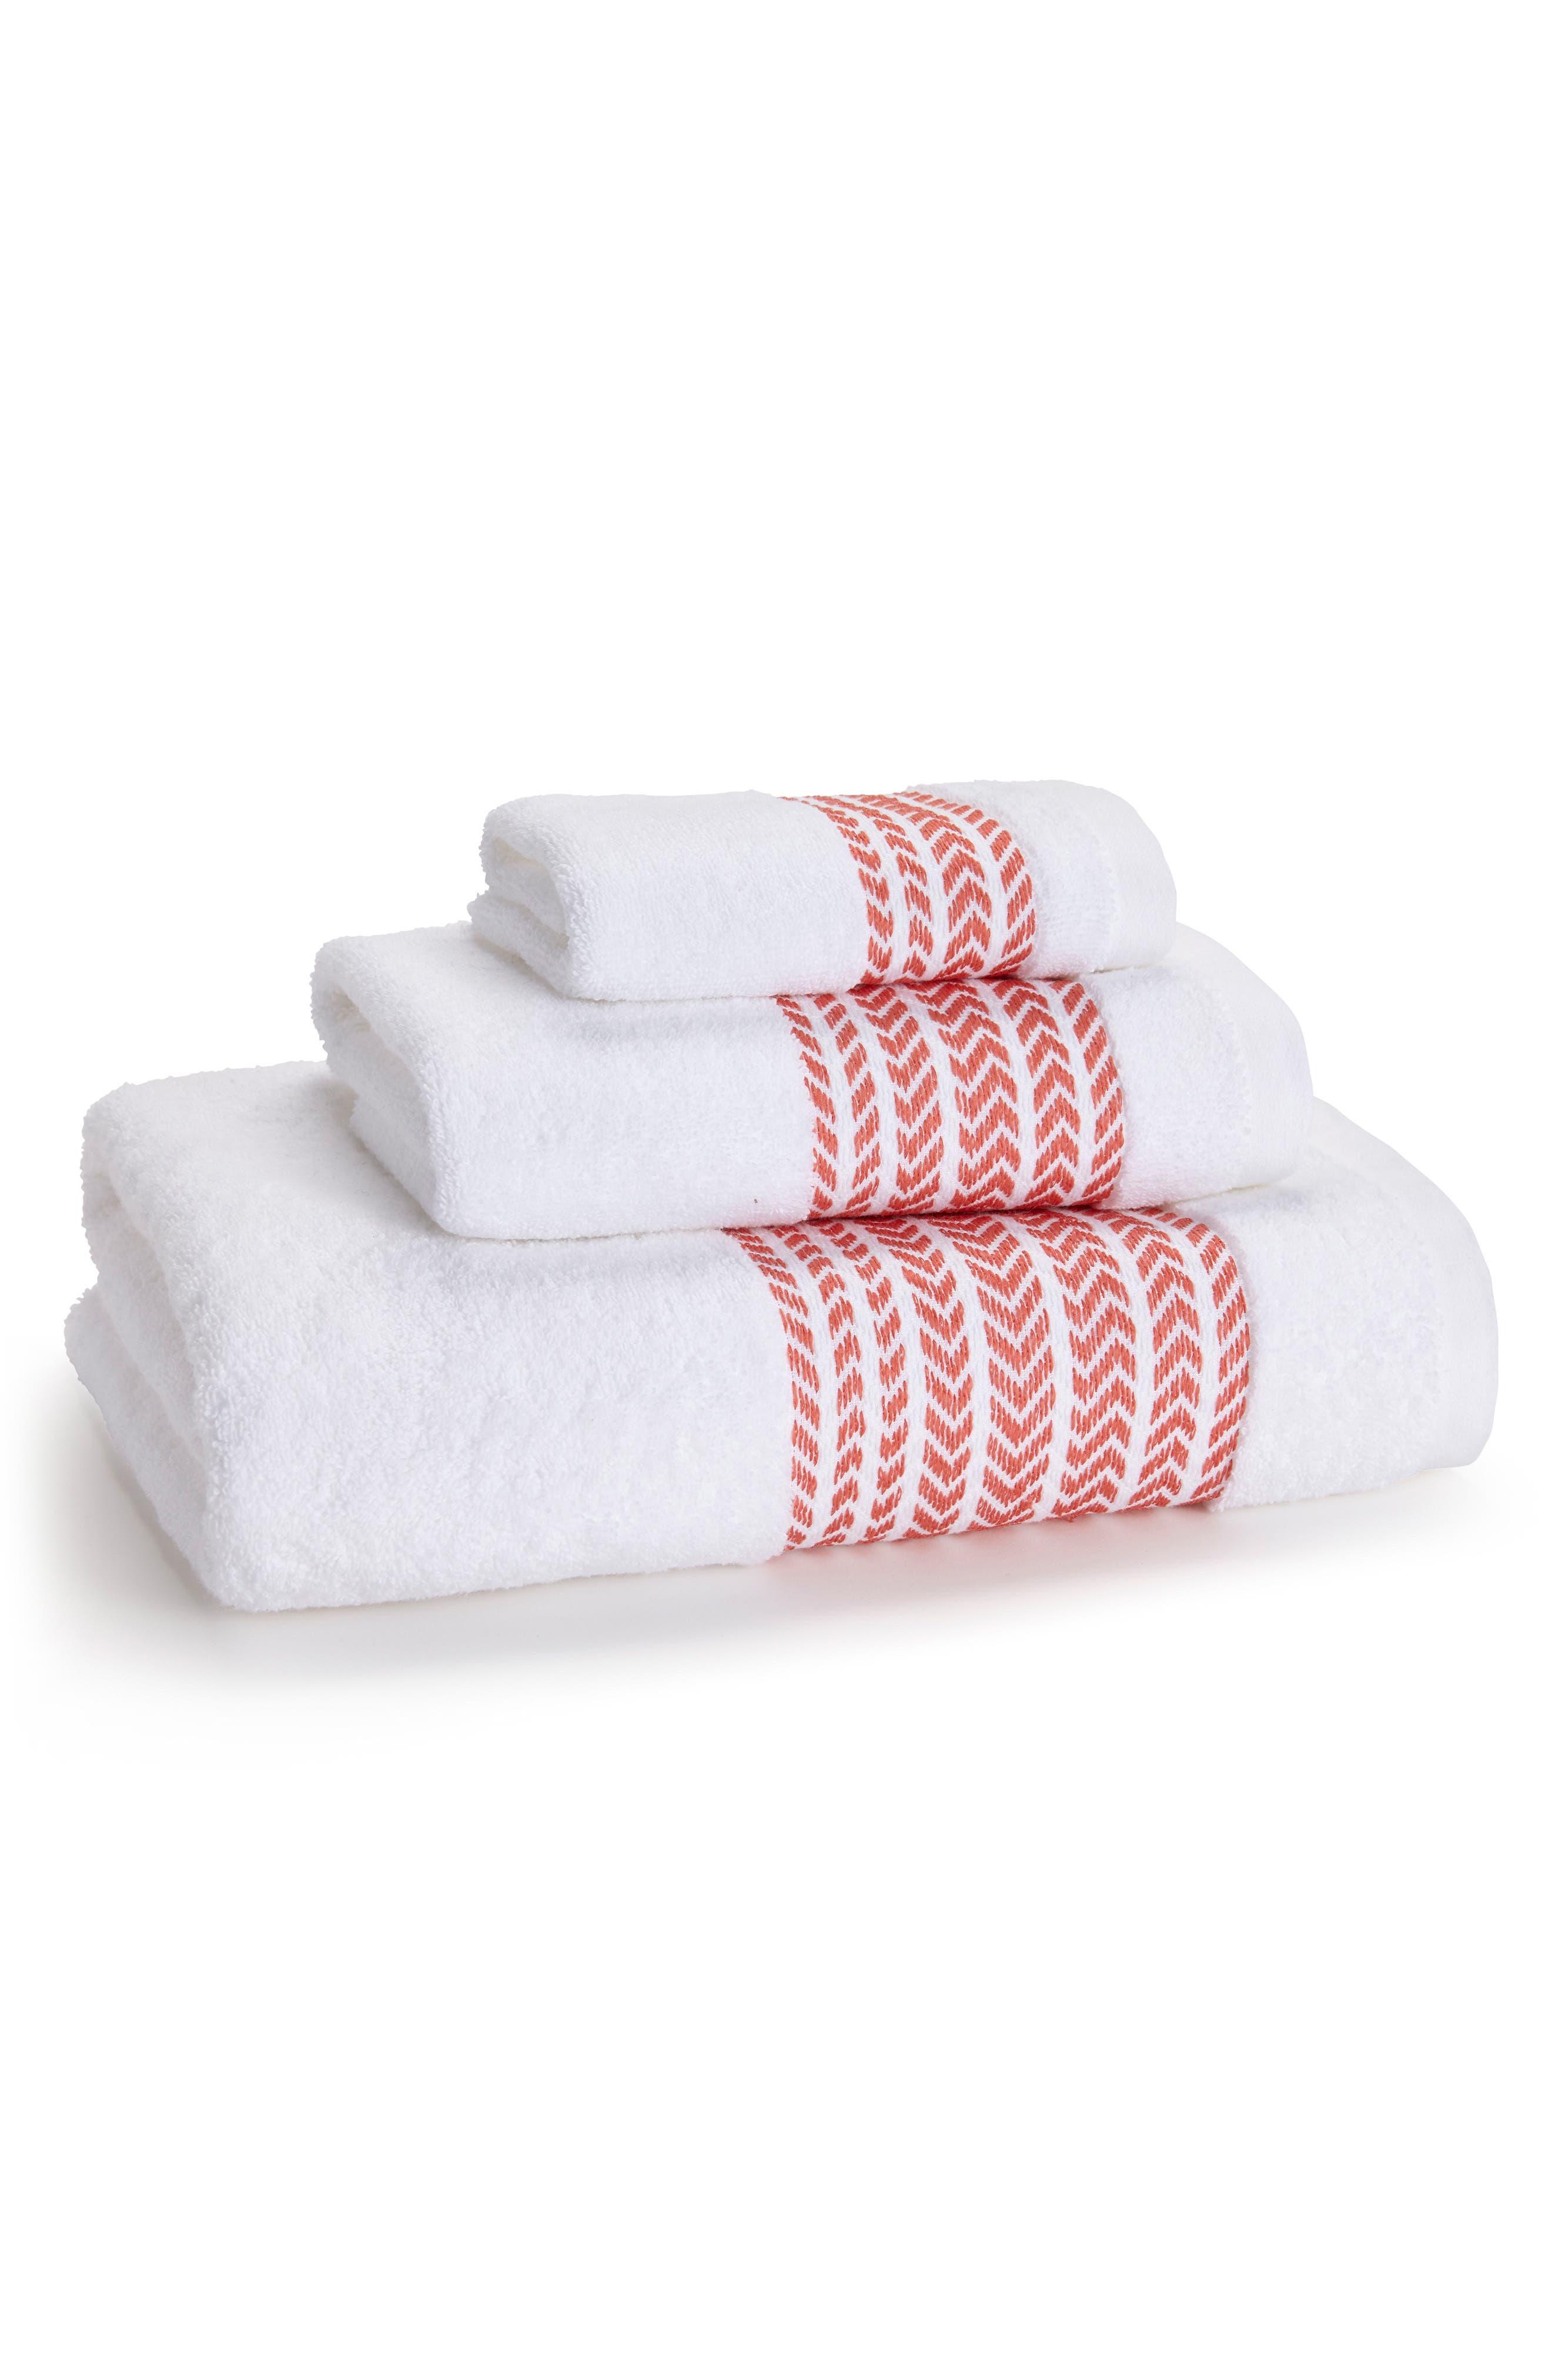 Baja Washcloth,                         Main,                         color, Poppy Coral